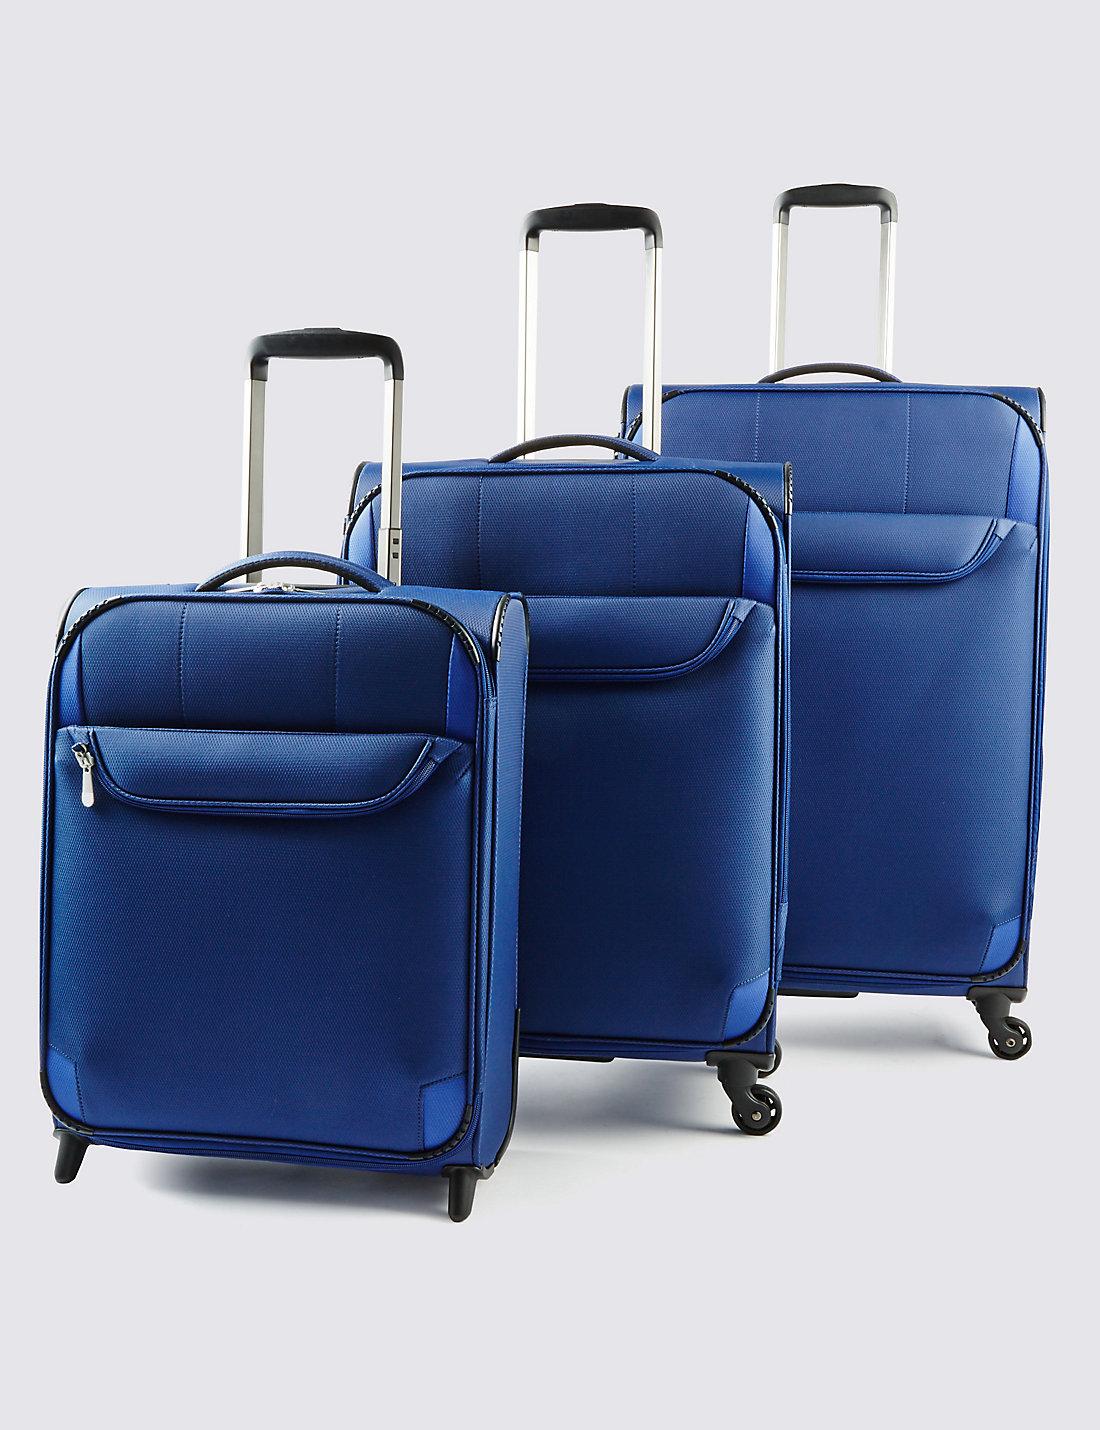 Large 4 Wheel Super Lightweight Suitcase | M&S